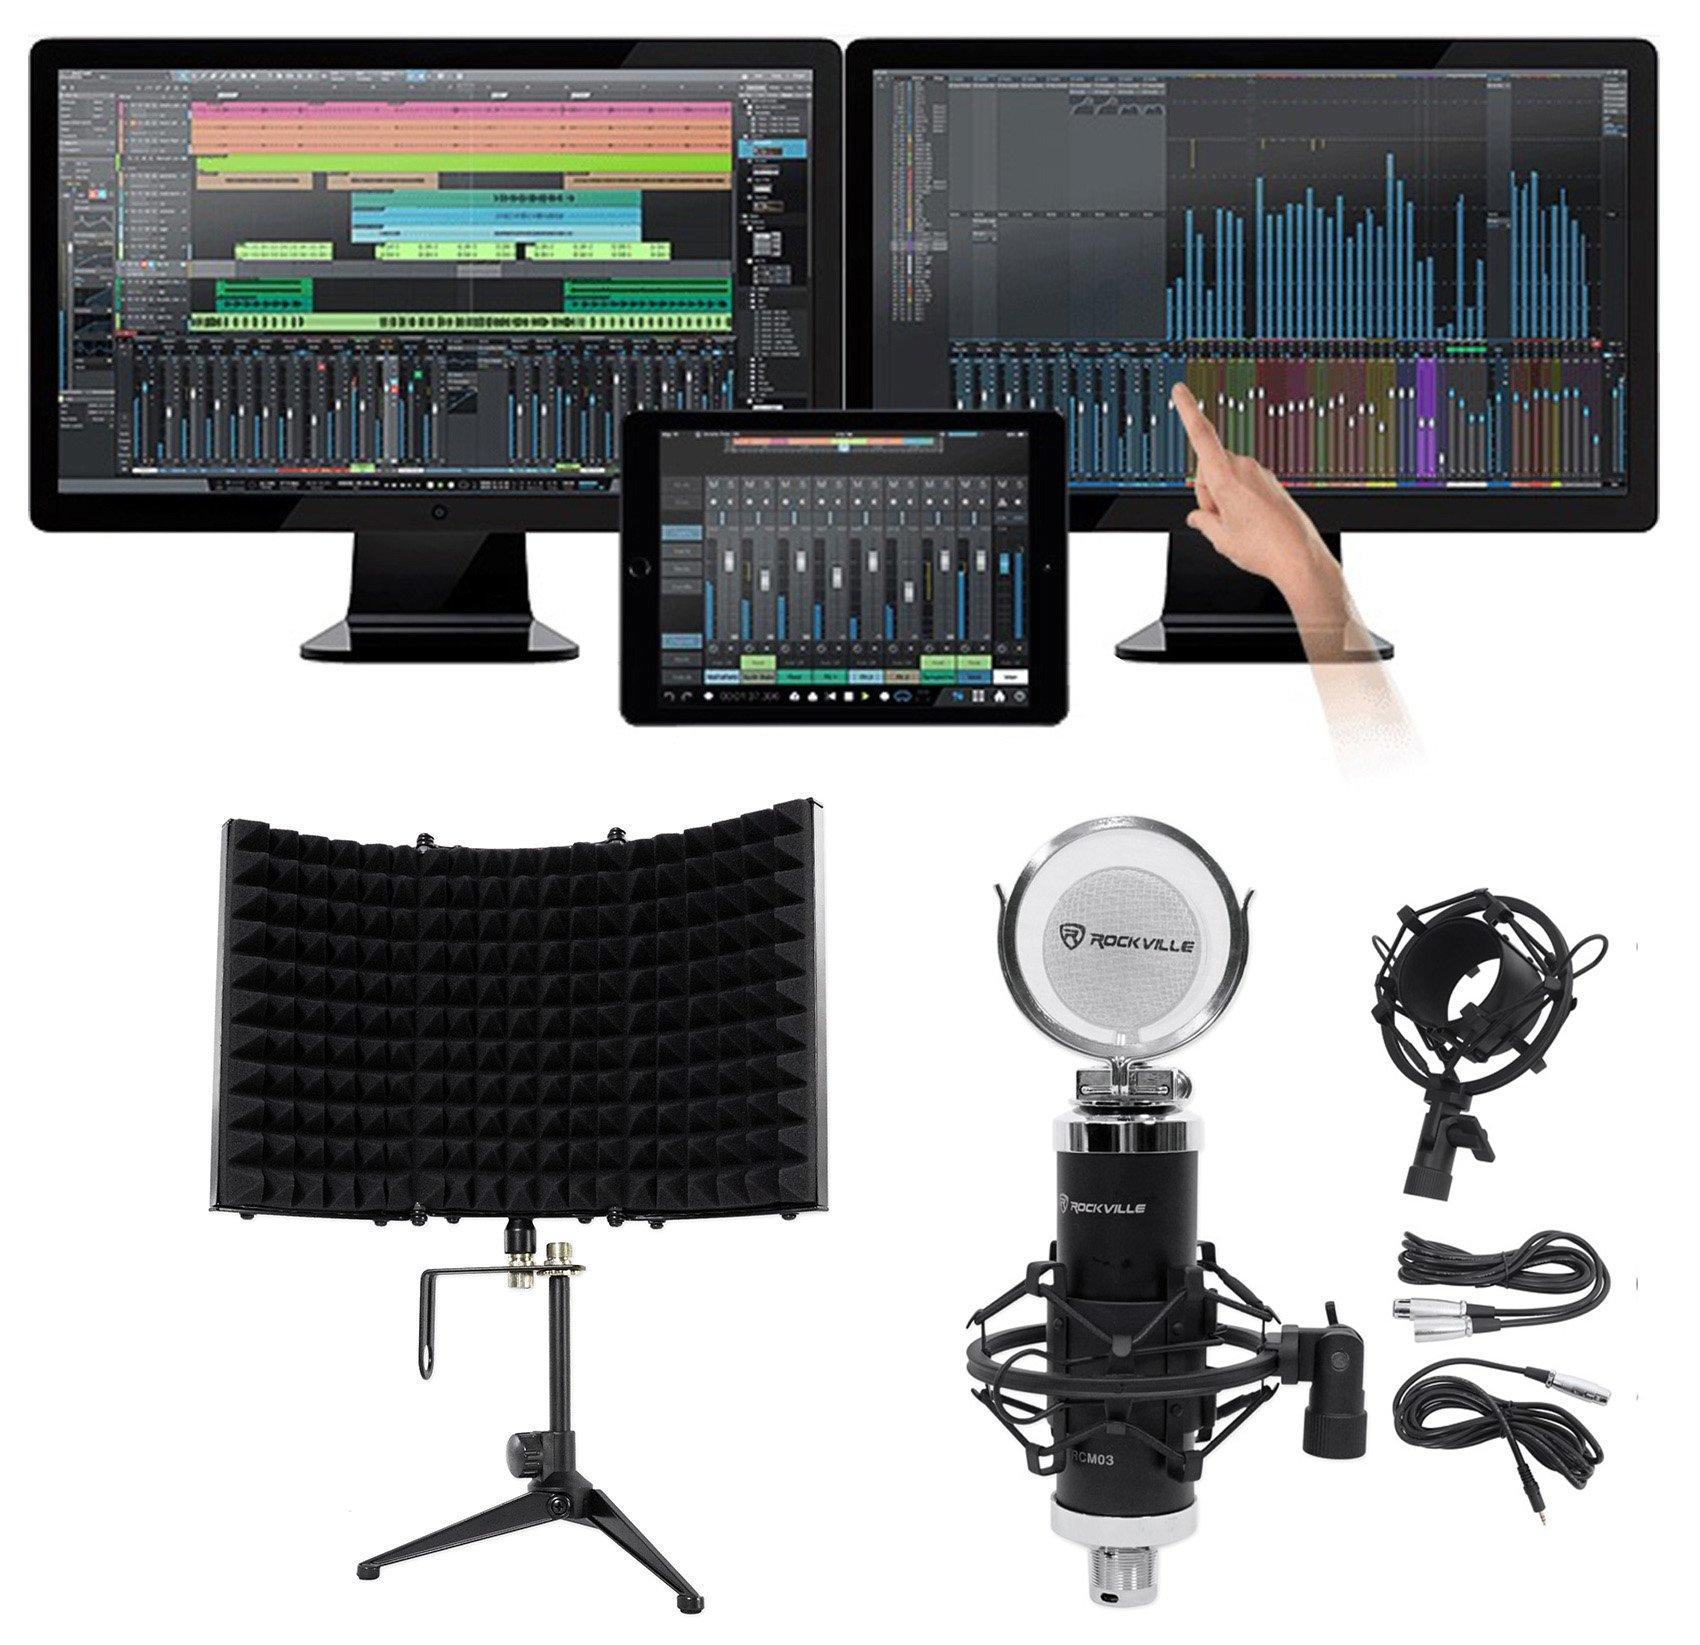 Presonus Studio One Upgrade Pro Version 1 & 2 TO Pro Version 3.2+Mic+Foam Shield